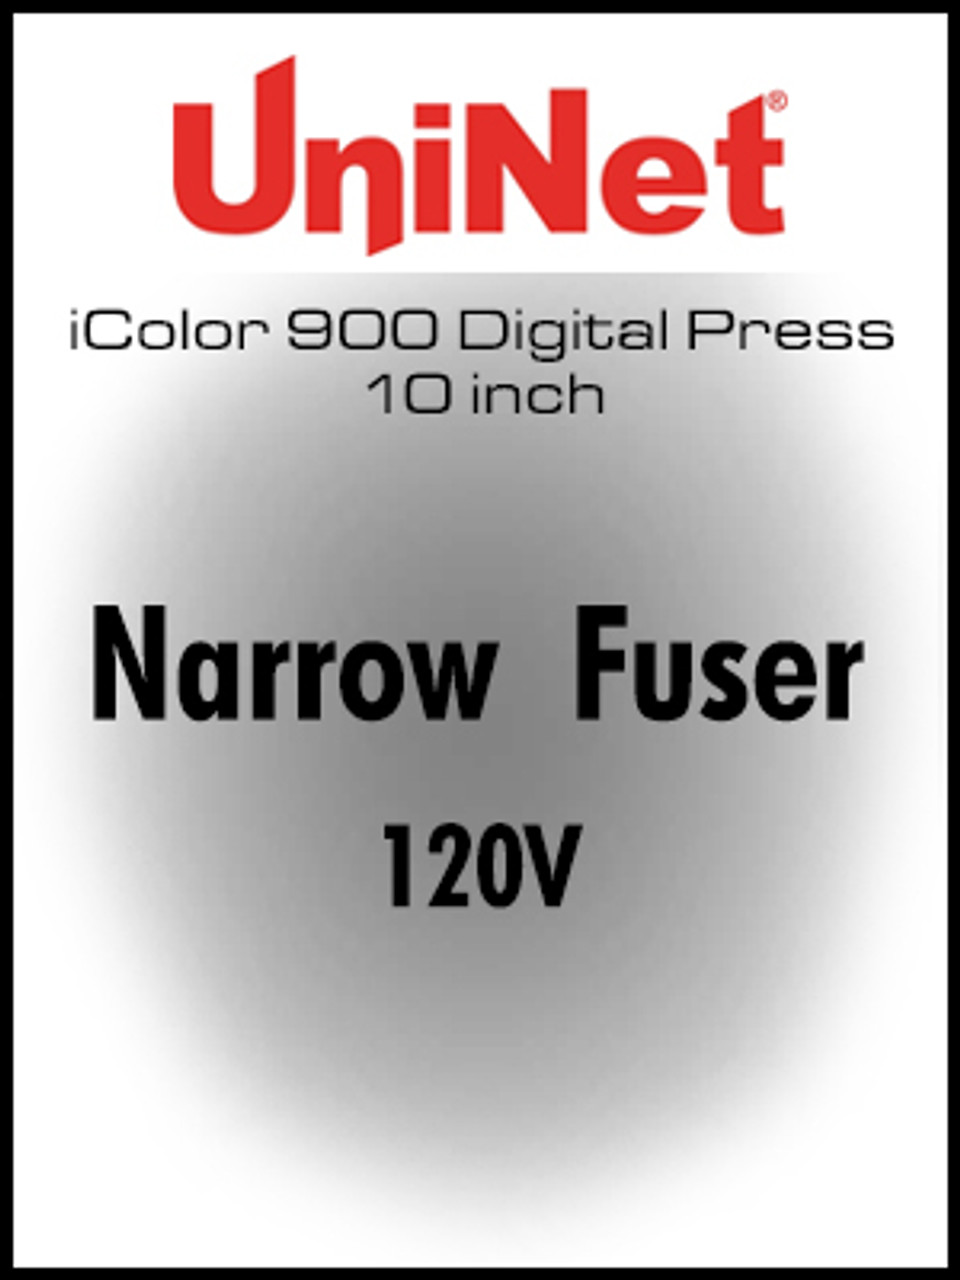 iColor 900 Digital Press 10 inch Narrow Fuser 120V